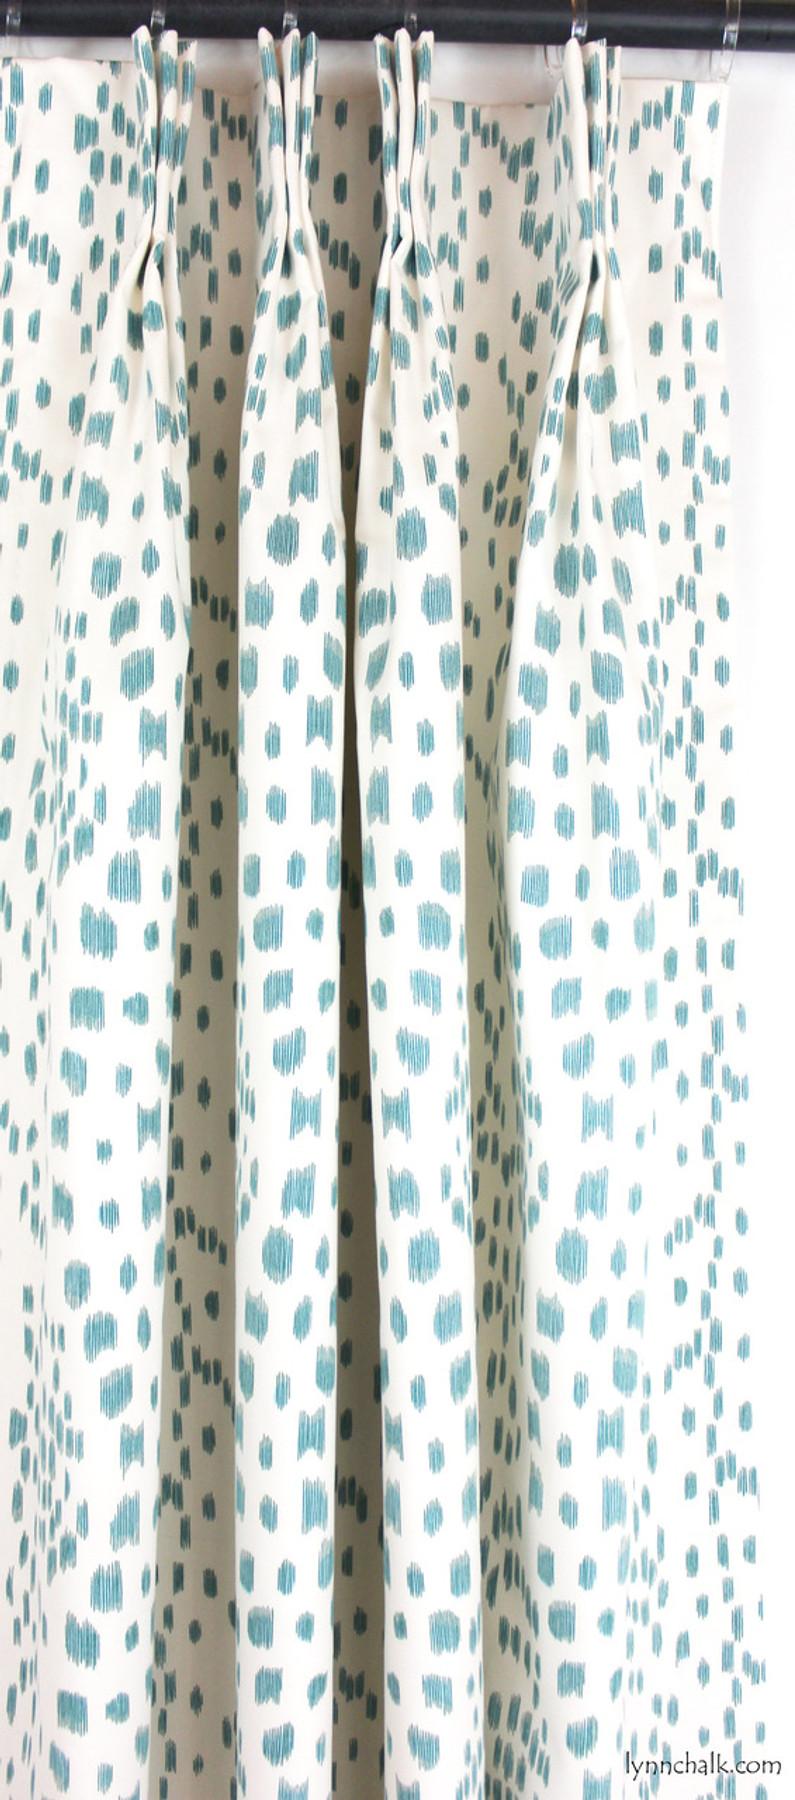 Custom Drapes by Lynn Chalk in Les Touches in Aqua